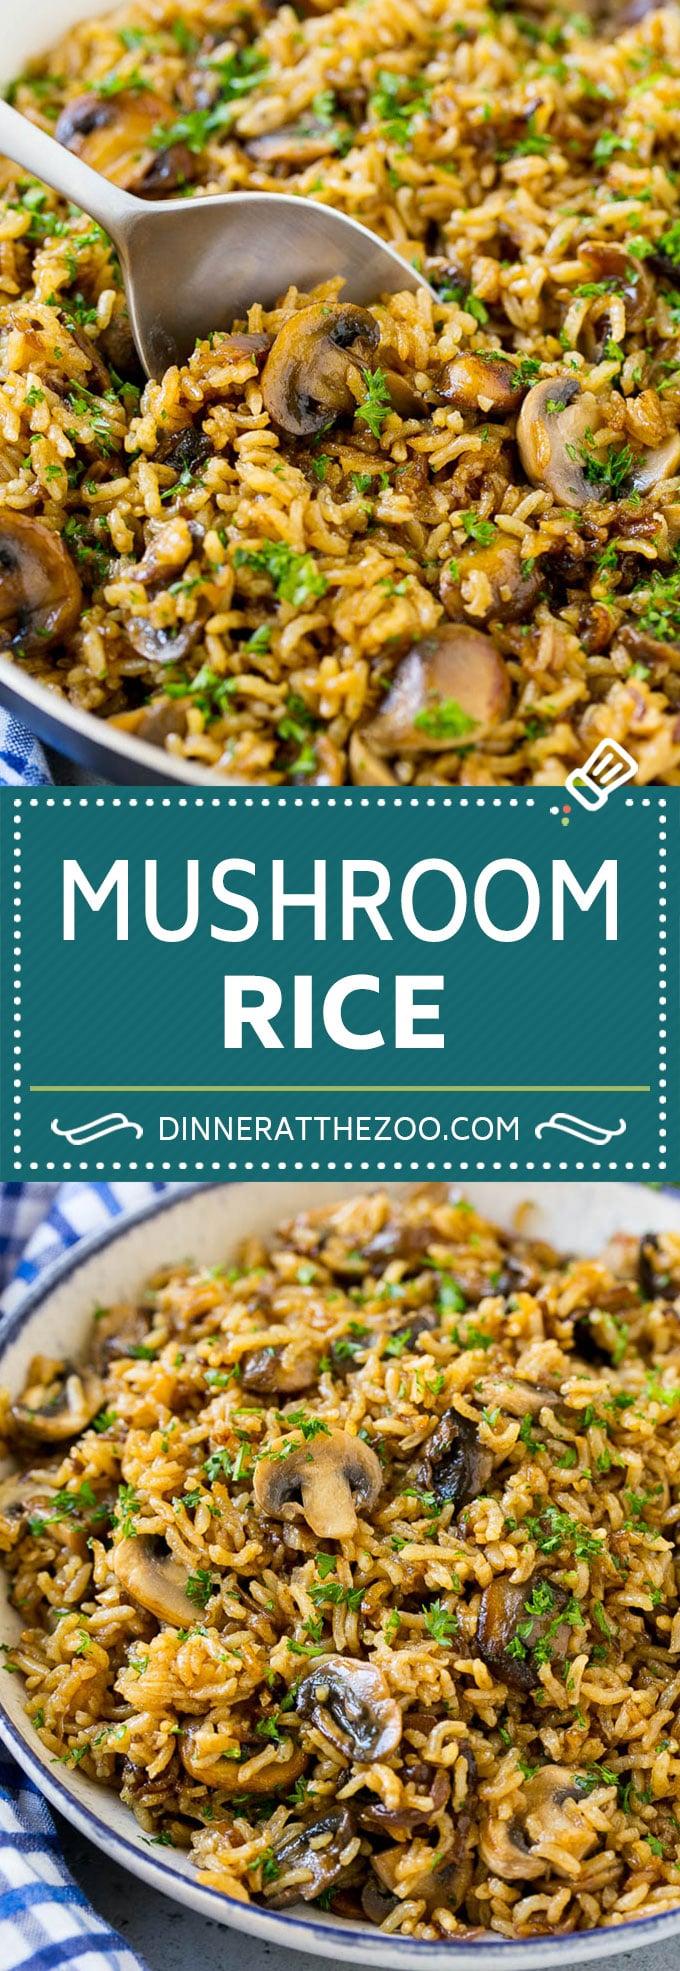 Receta de arroz con champiñones |  Arroz al horno |  Rice Pilaf #rice #mushrooms # sidedish # dinner #dinneratthezoo